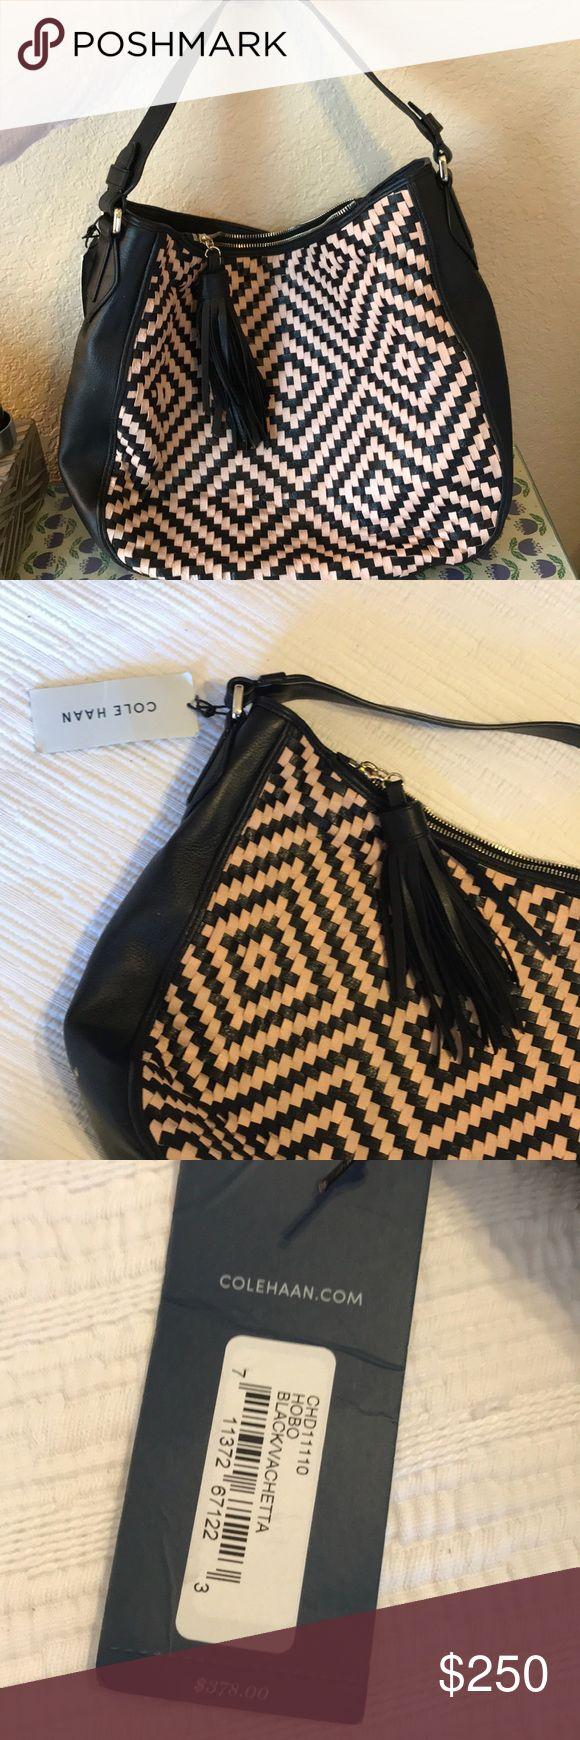 Cole Haan Black/Tan Hobo with Tassel Brand new with tags. Cole haan Black and Tan leather hobo purse with tassel on zipper Cole Haan Bags Hobos